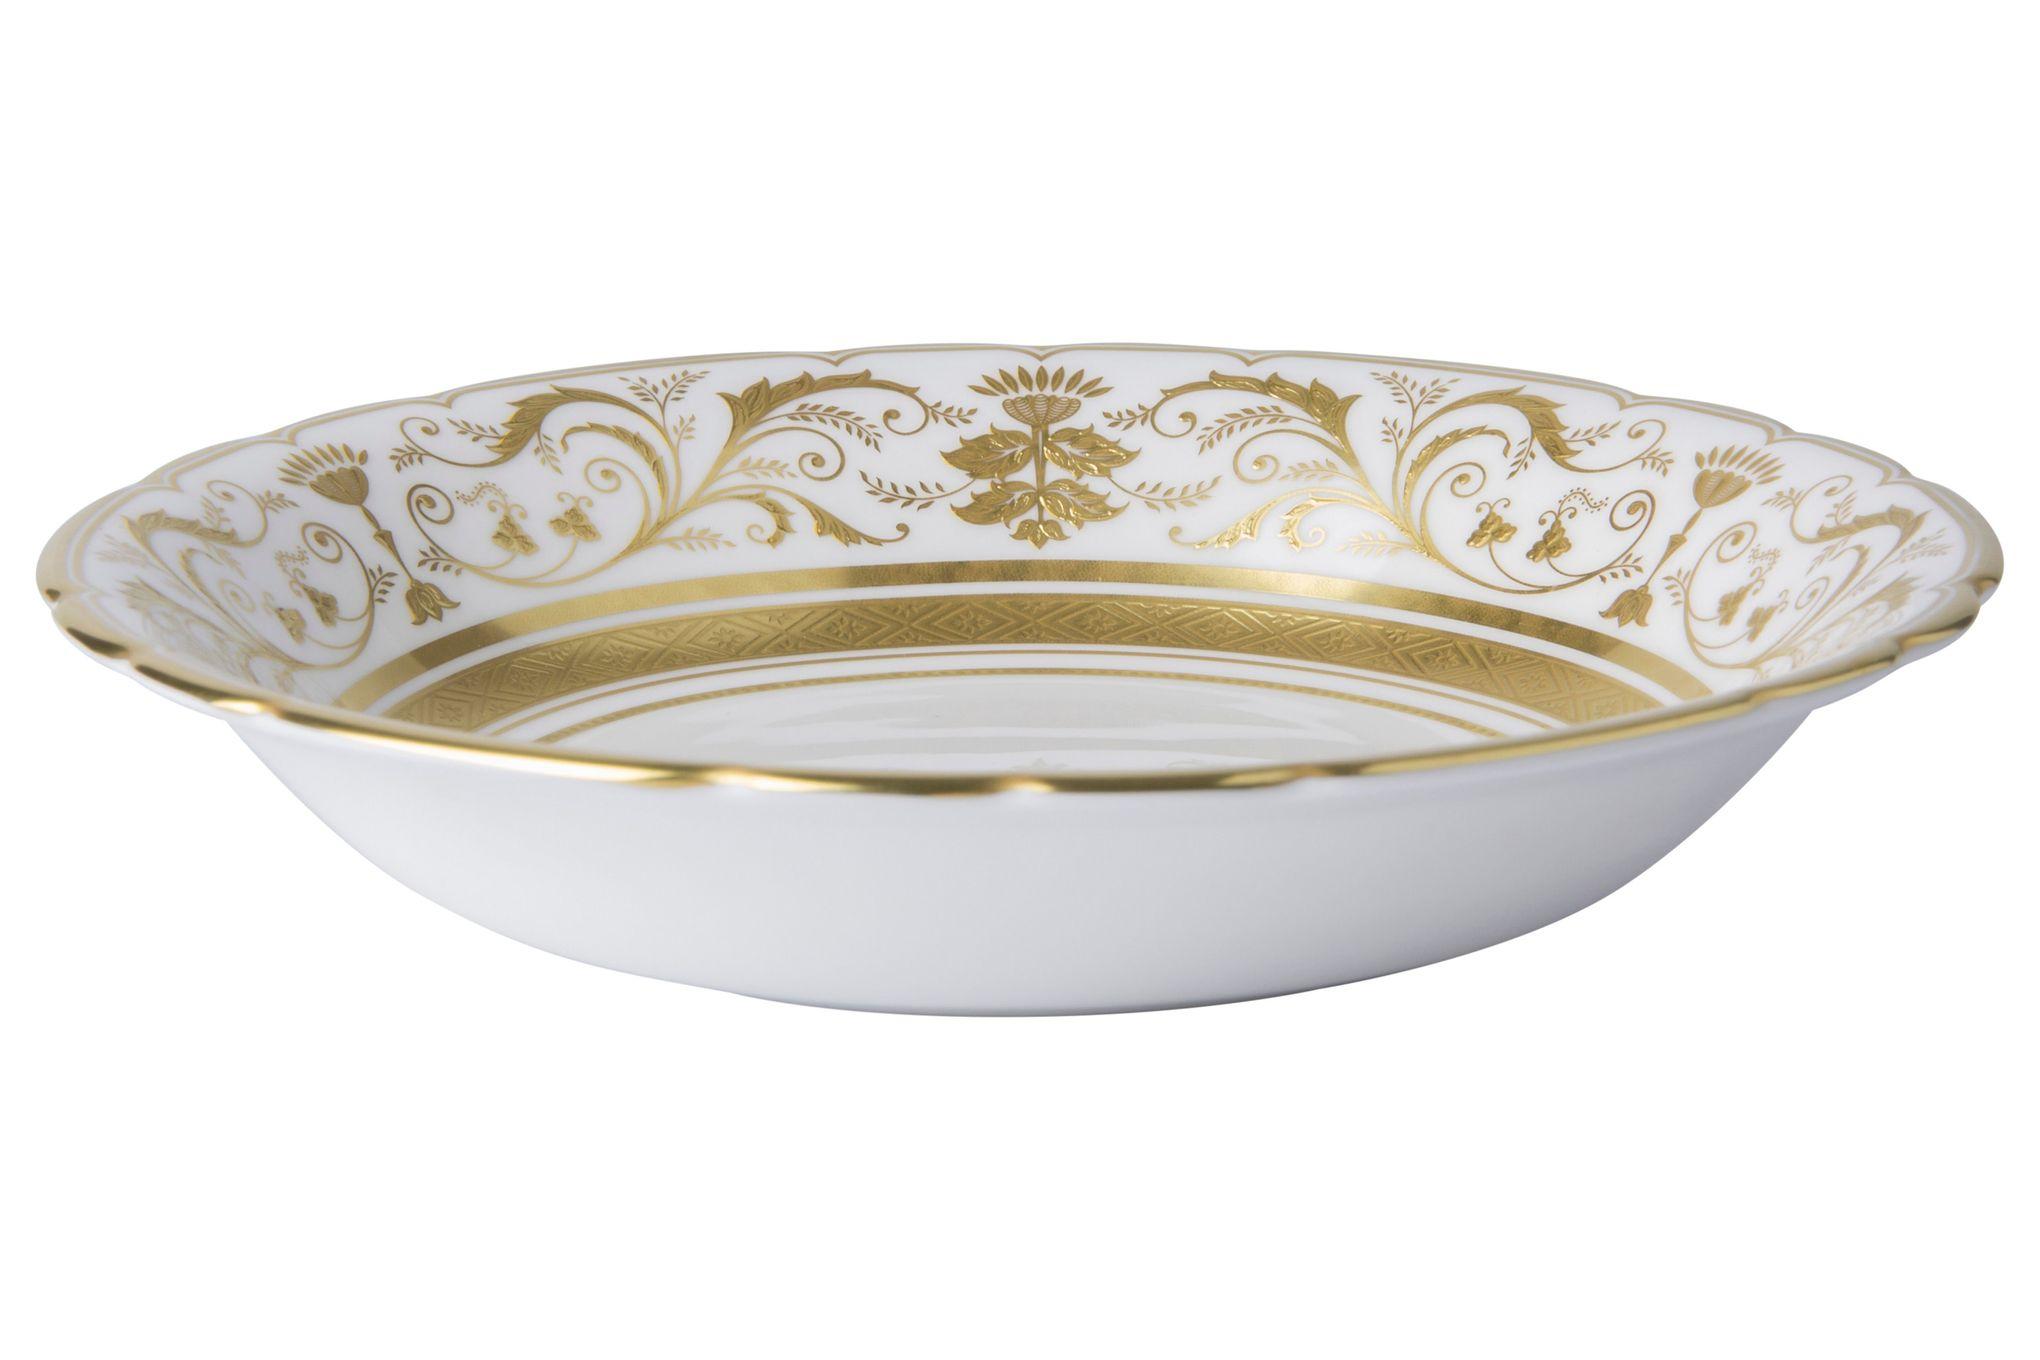 Royal Crown Derby Regency - White Cereal Bowl 16.5cm thumb 1